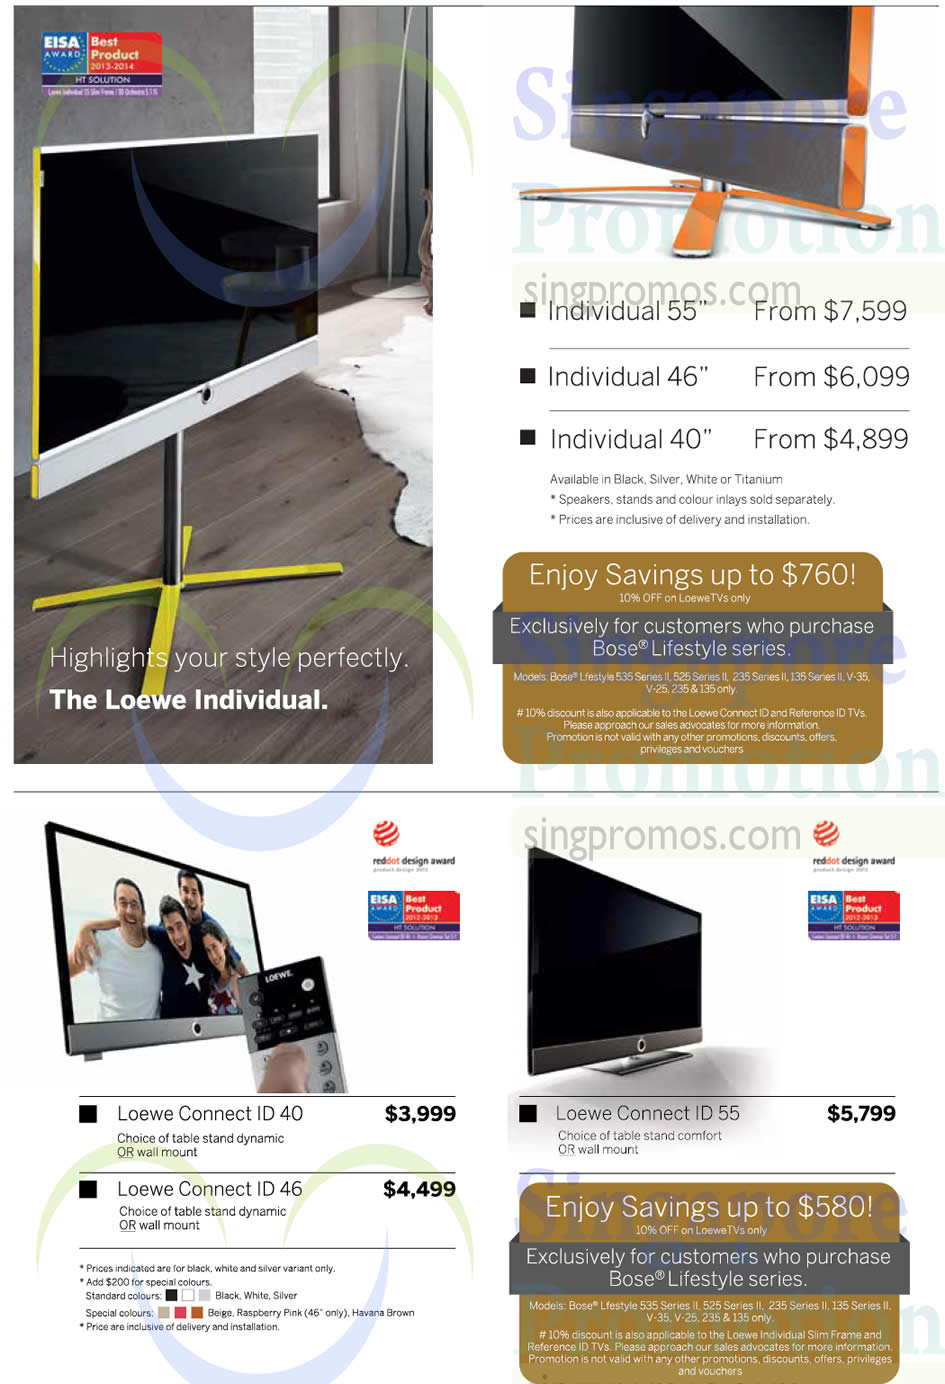 5 aug loewe individual 55 46 40 loewe connect id 40 46 55 bose loewe promo offers 1. Black Bedroom Furniture Sets. Home Design Ideas